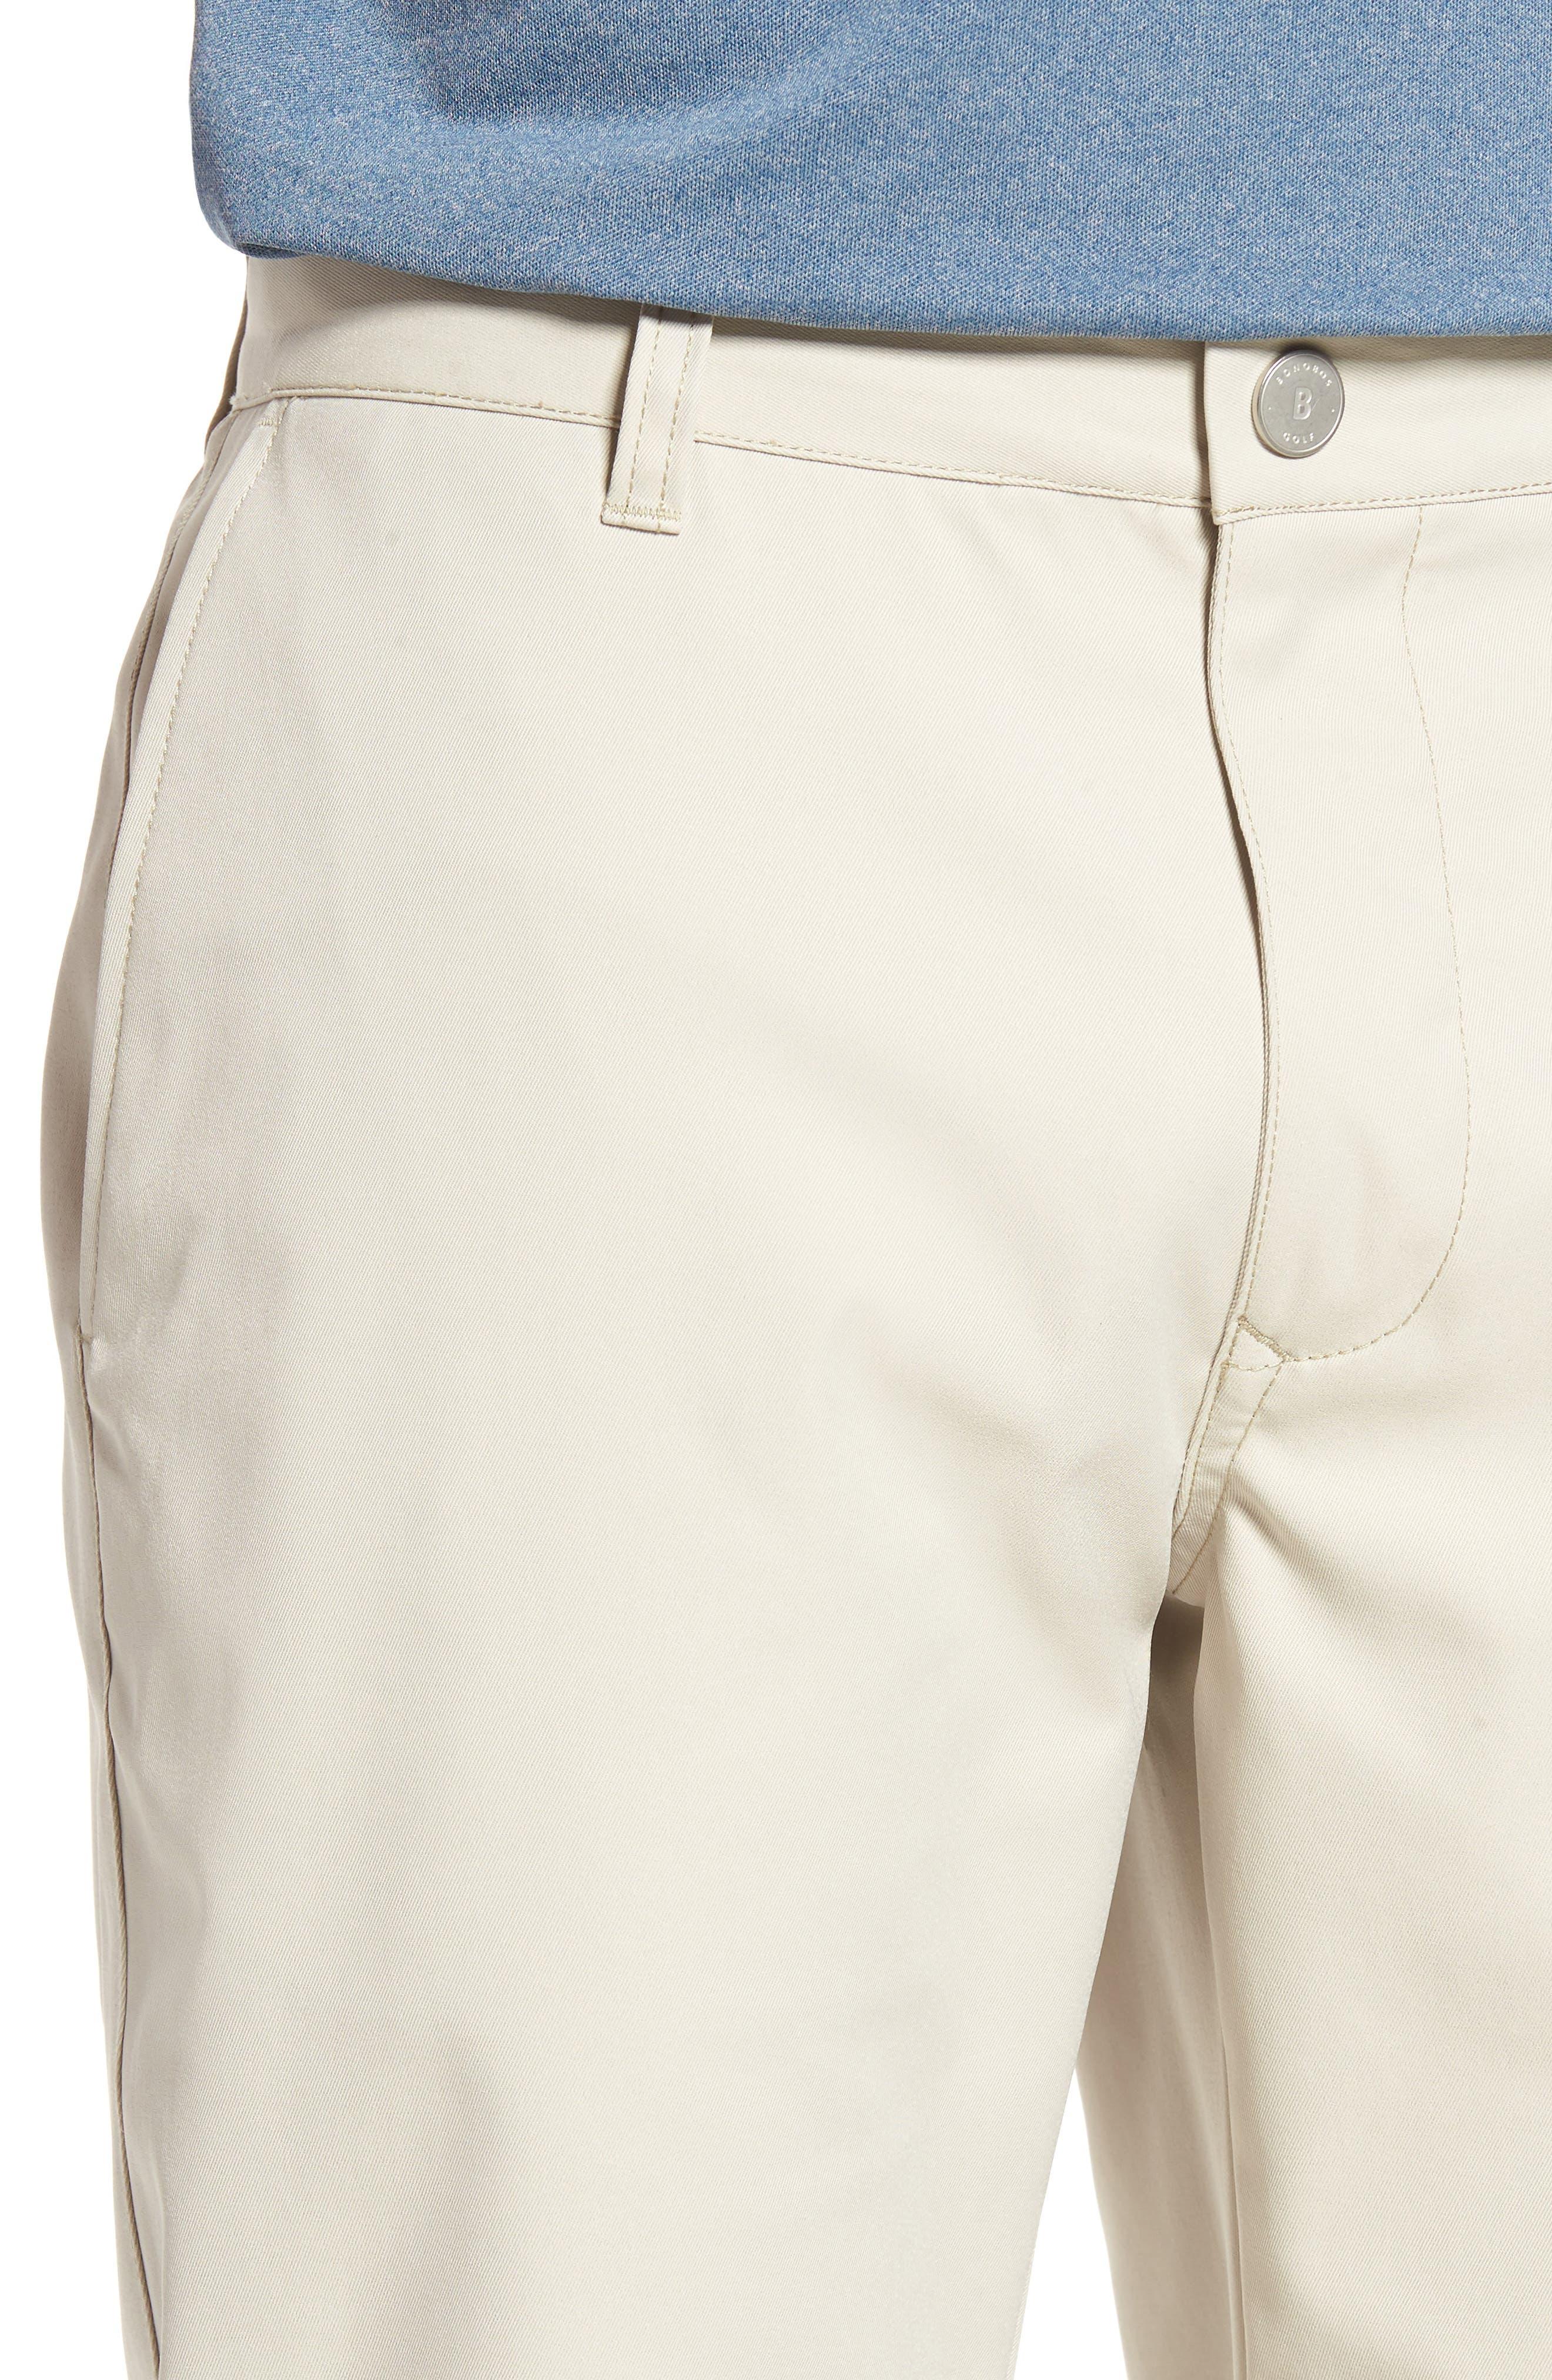 Highland Slim Fit Golf Pants,                             Alternate thumbnail 4, color,                             STONE